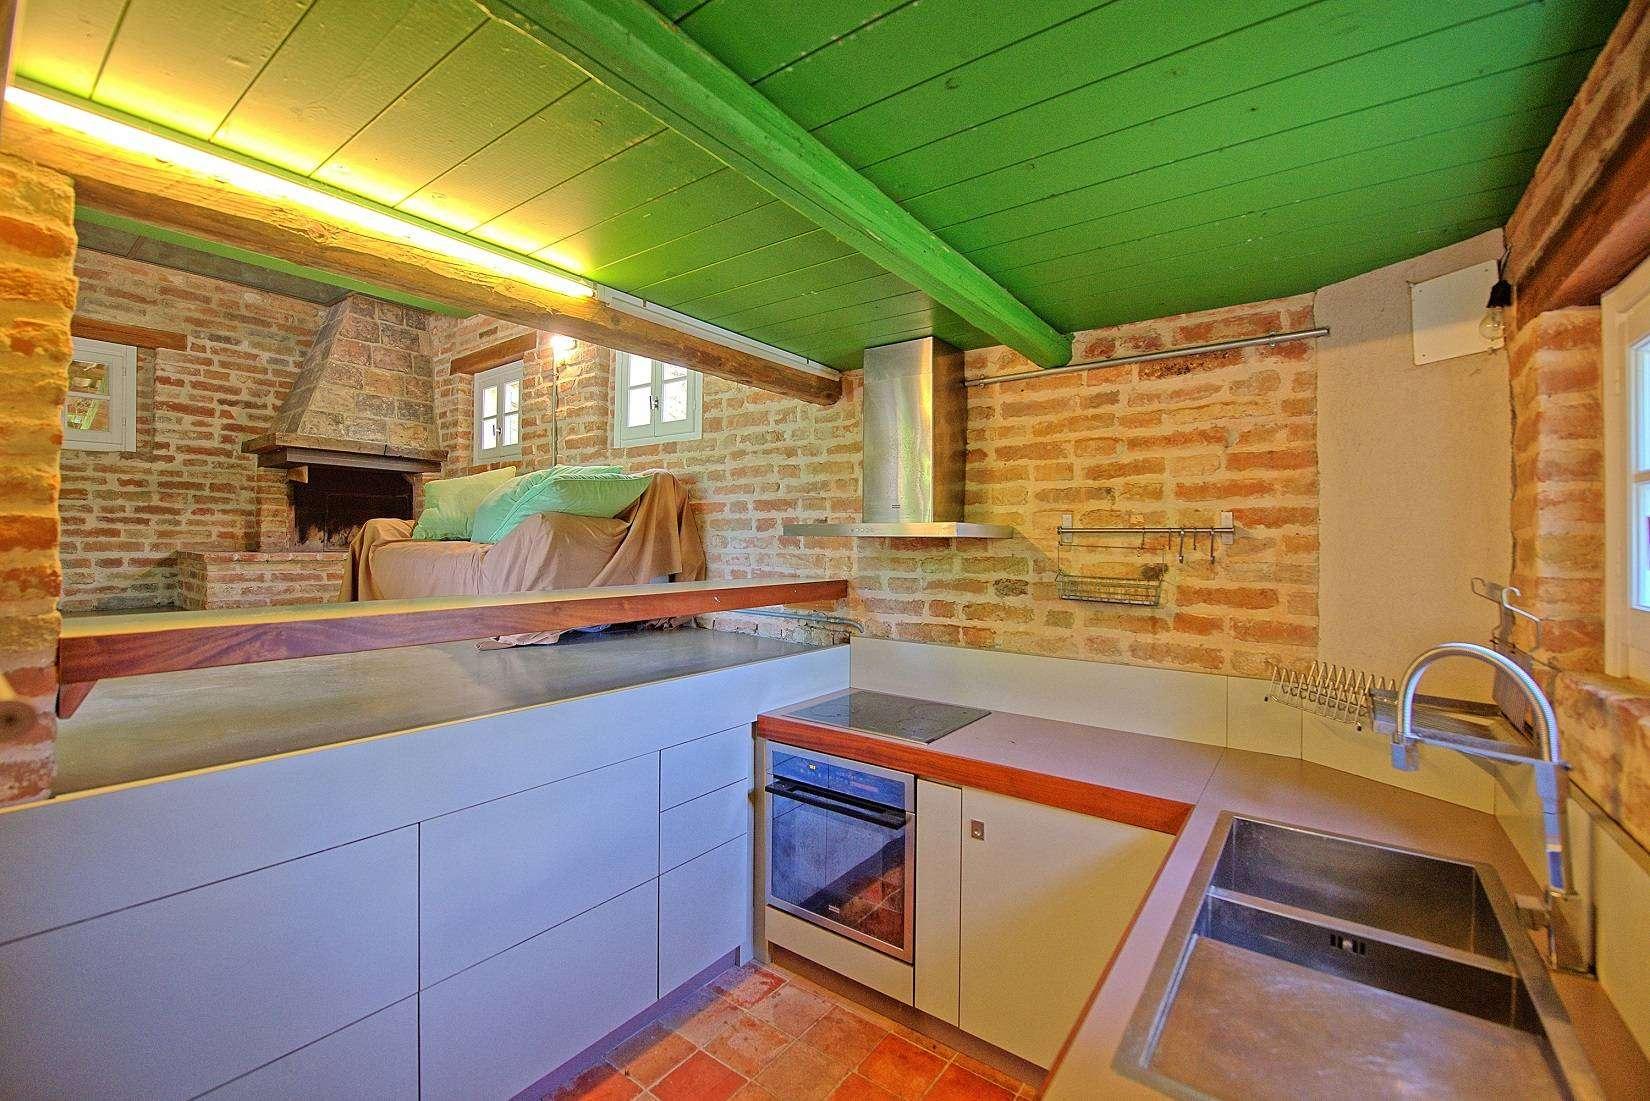 14 Jacopo Kitchen